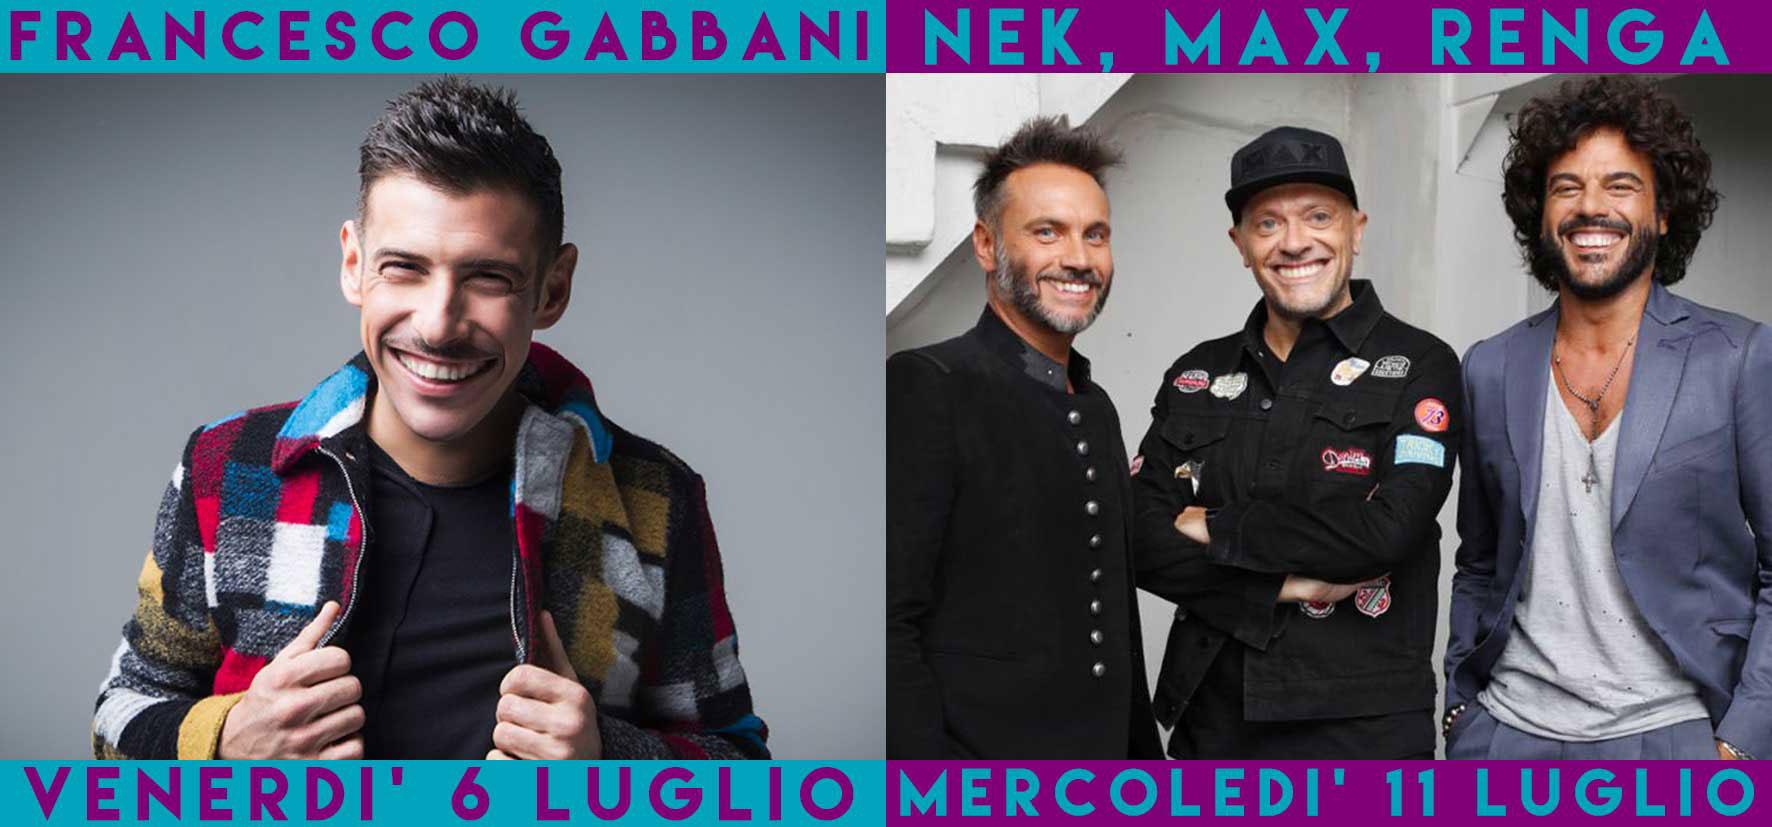 Francesco Gabbani - Nek - Max - Renga